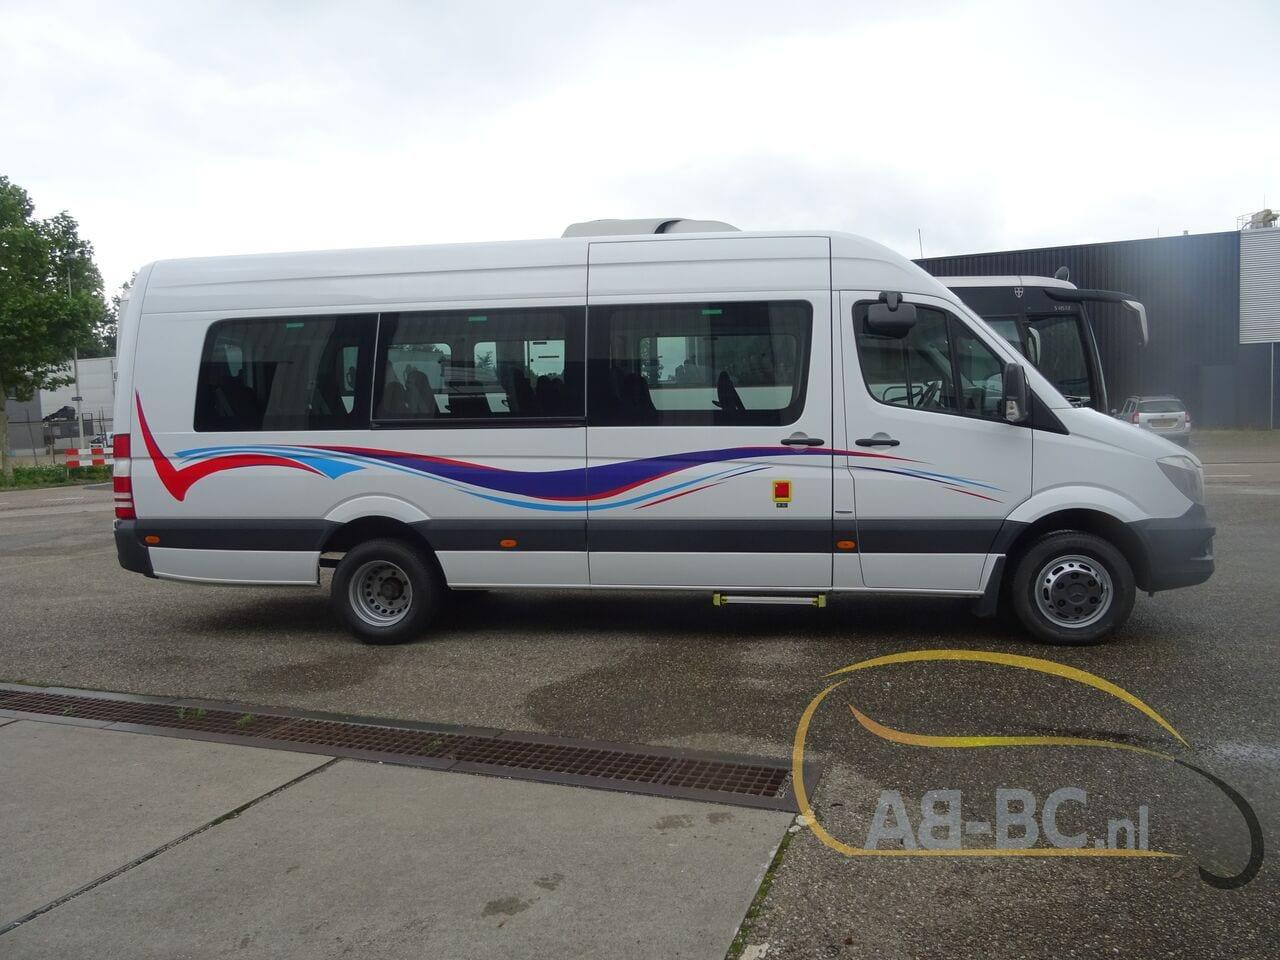 coach-busMERCEDES-BENZ-516-CDI-Sprinter-Transfer-45-23-Seats-EURO-6---1625493724903017007_big_ea11818bb36b2f878b697dfa35377231--21060112394245379500